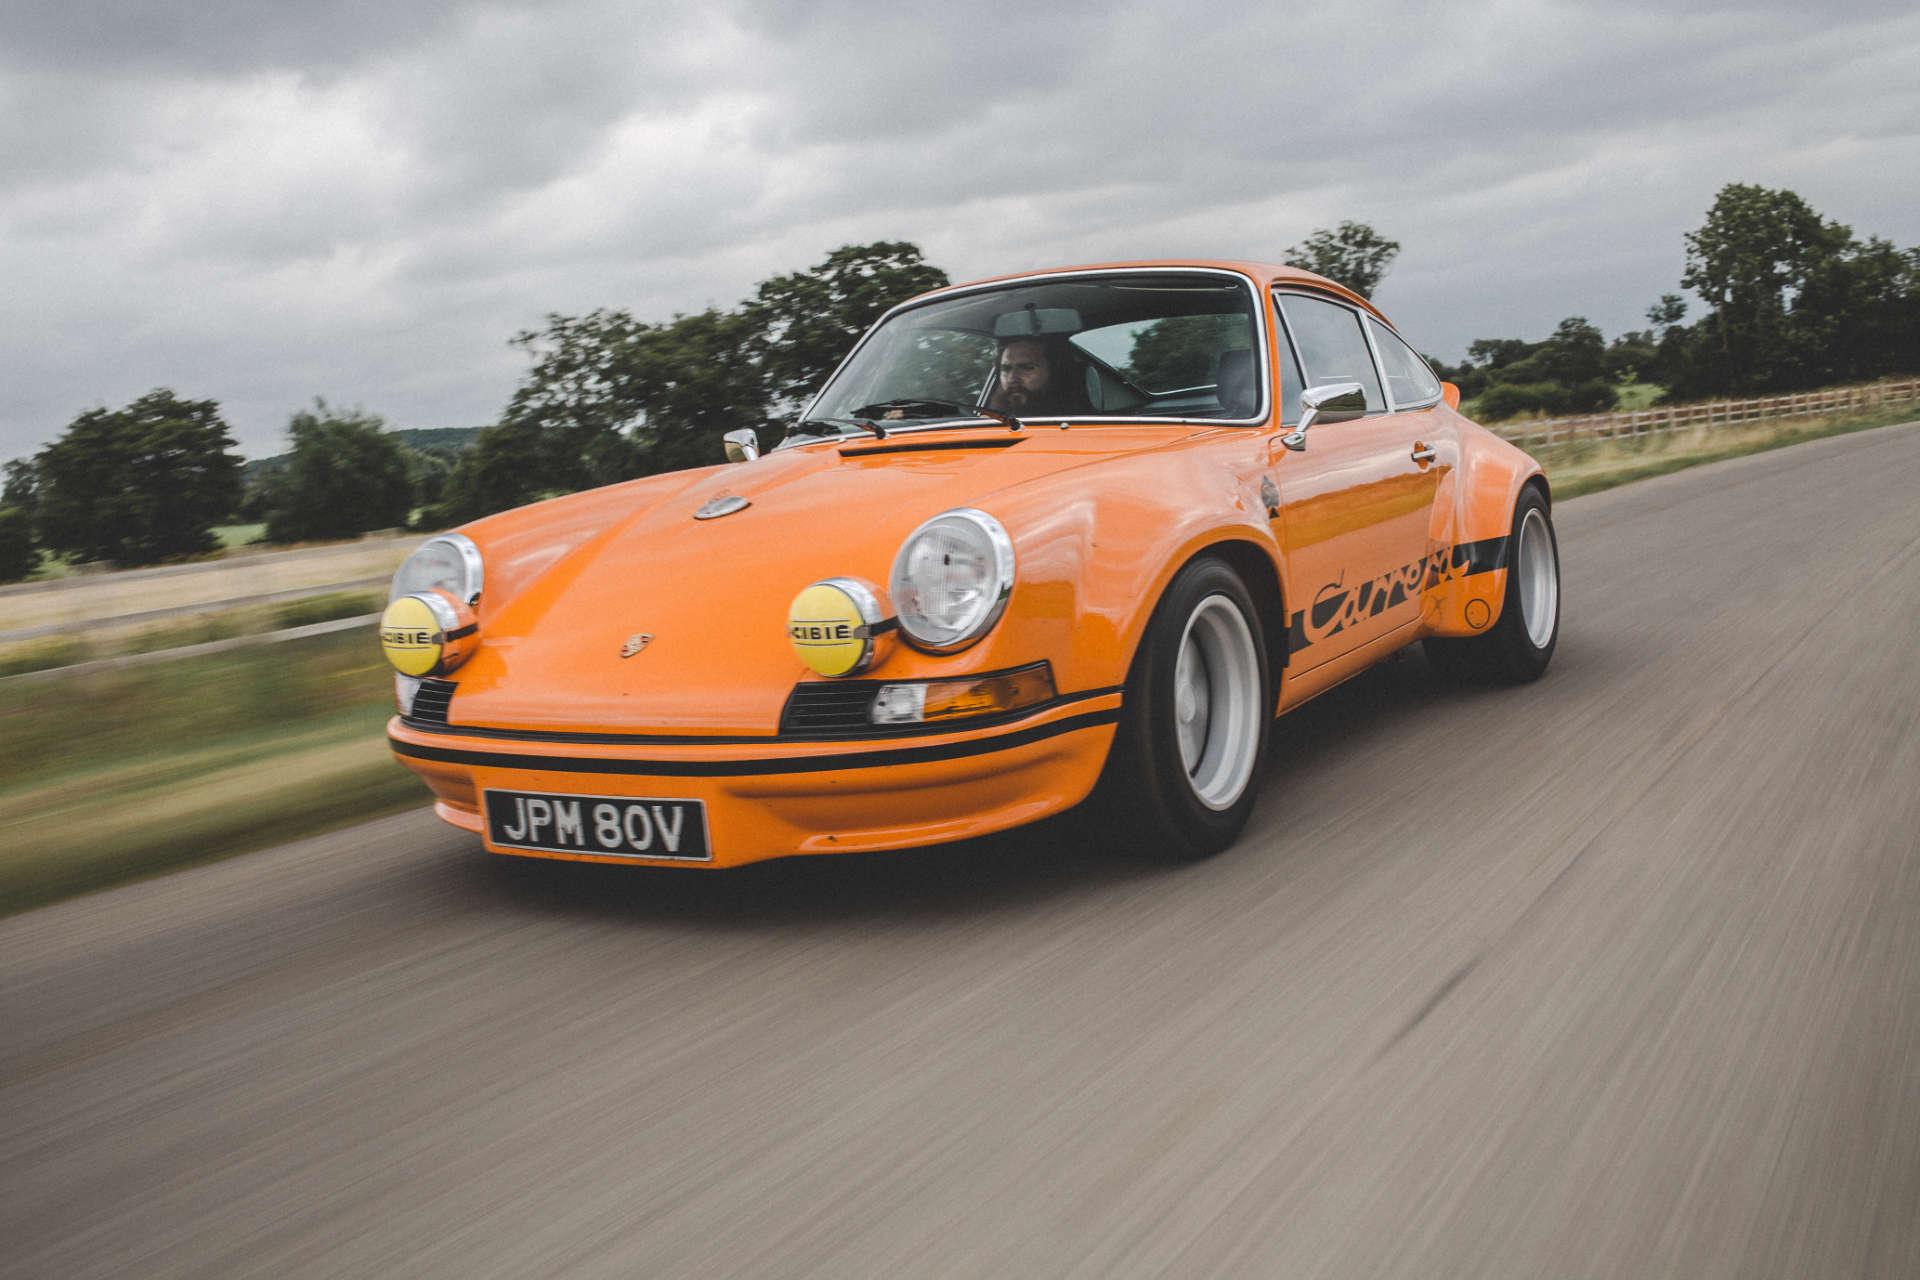 Porsche 911 RSR Hot Rod Outlaw